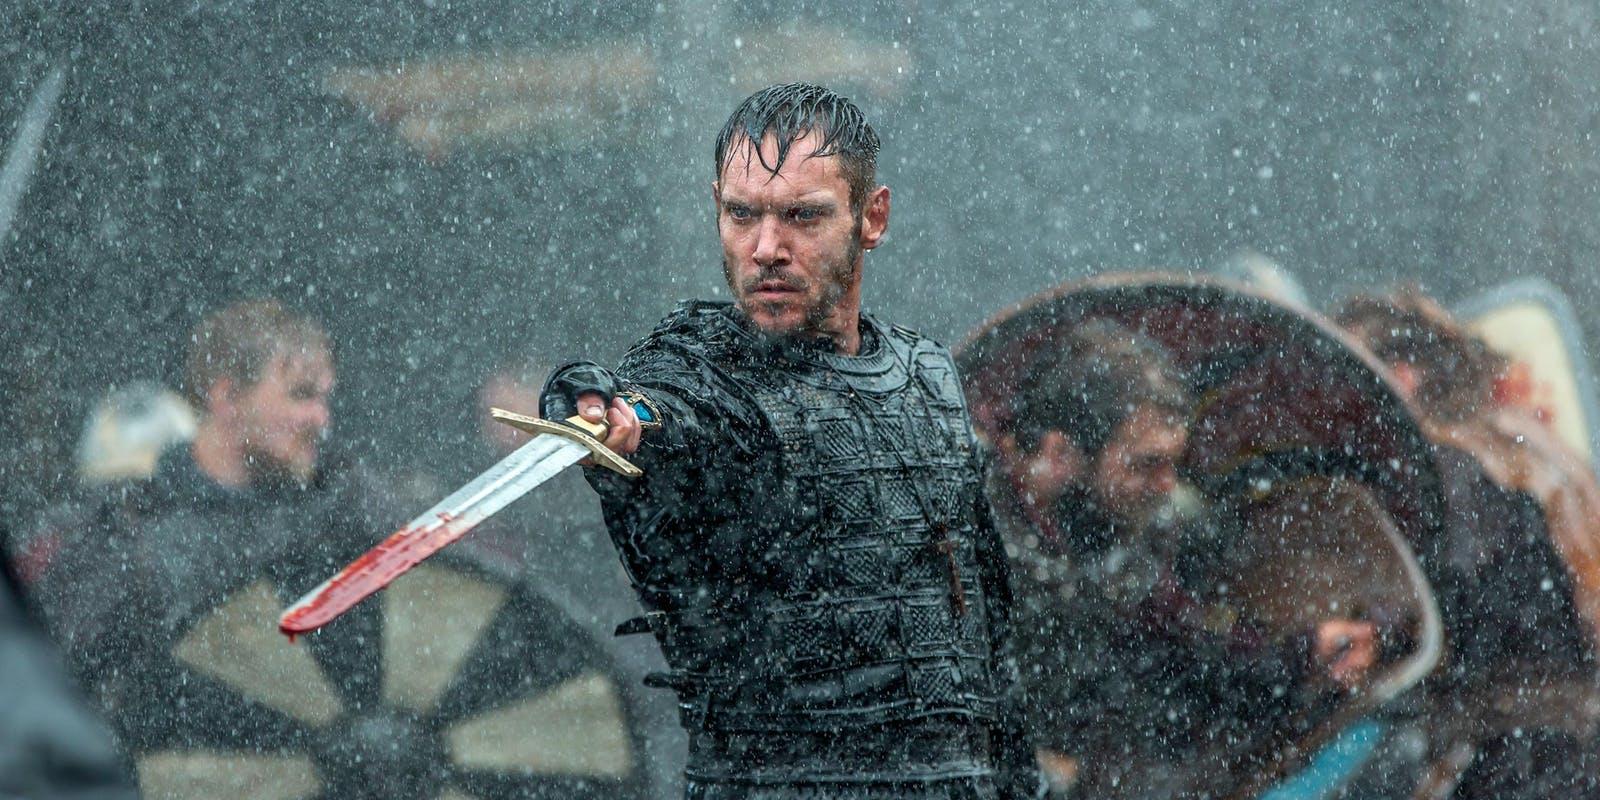 Jonathan-Rhys-Meyers-in-Vikings-Season-5